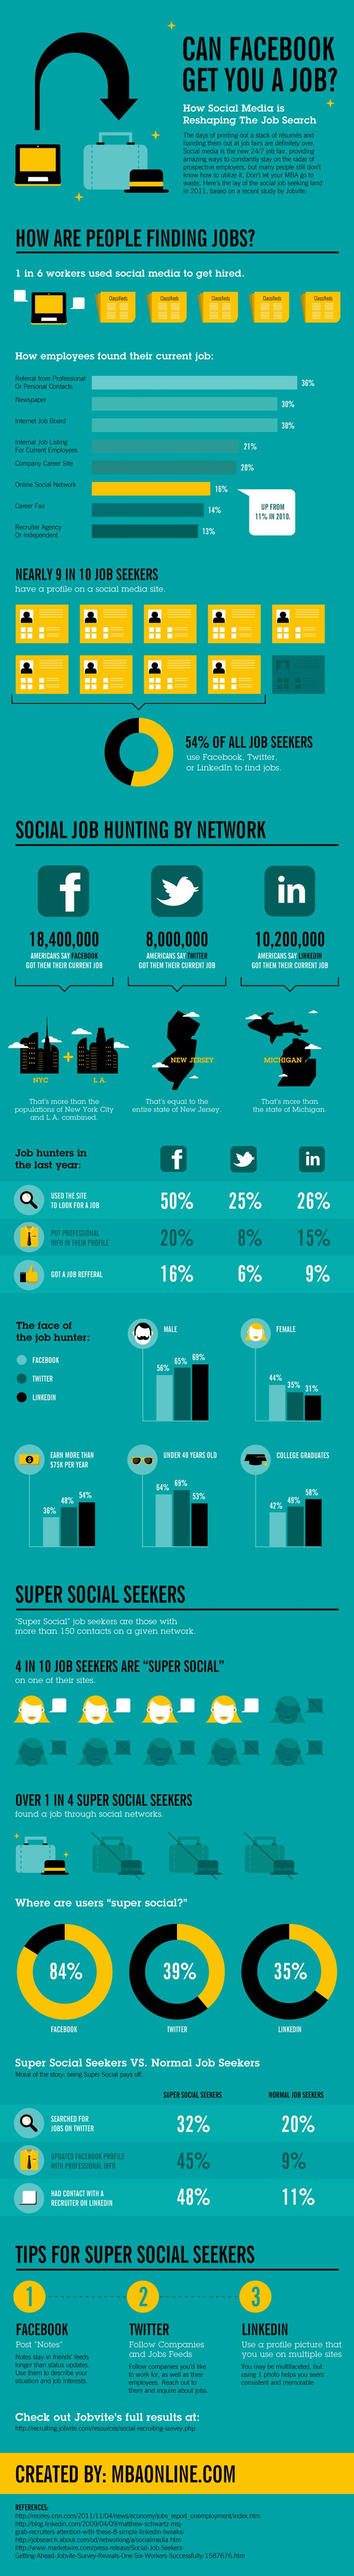 Social Media Job Search Infographic